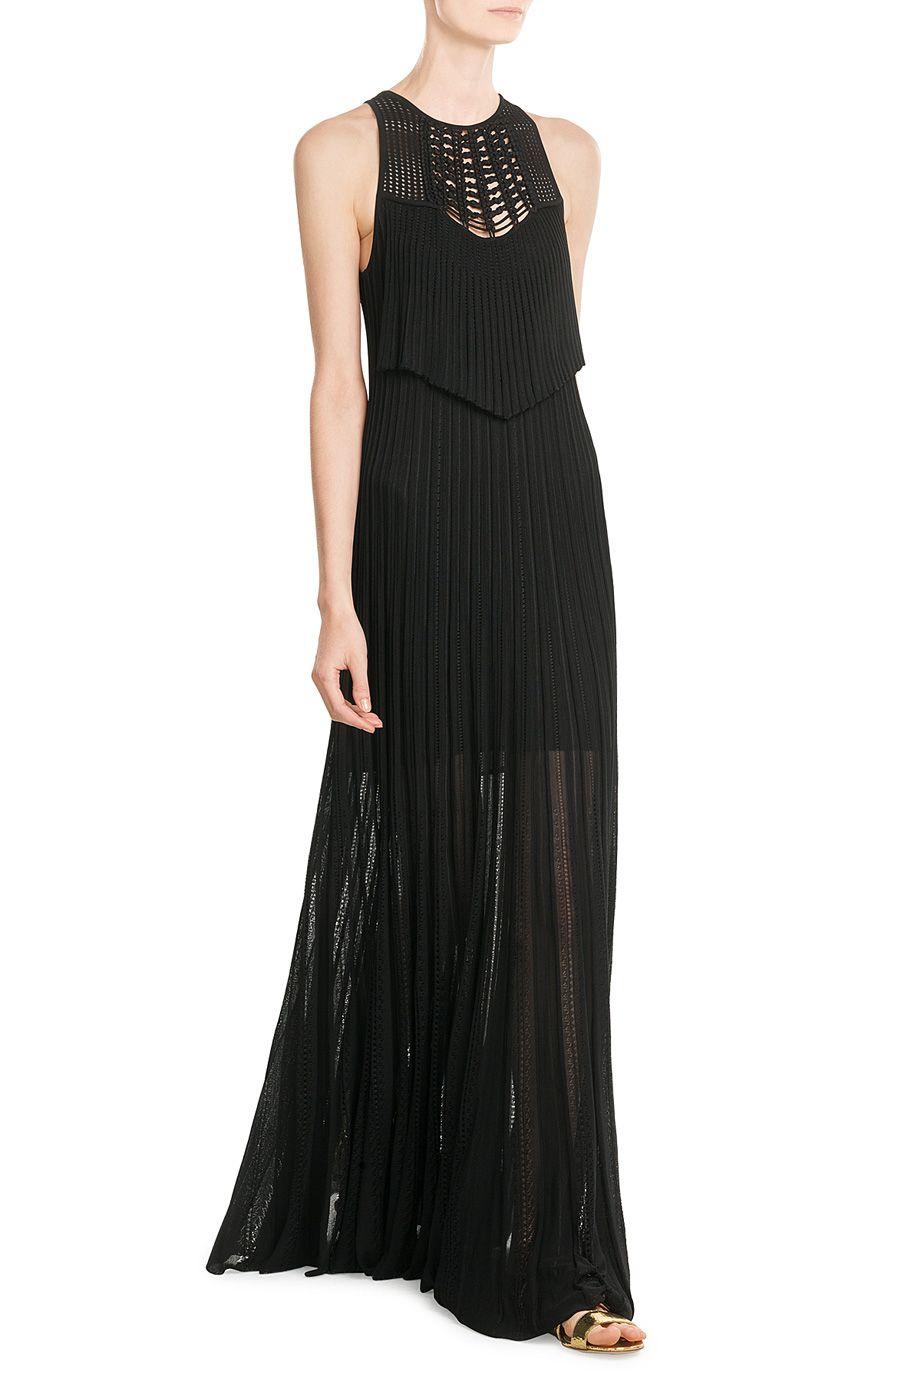 OMG, this Cavalli dress!